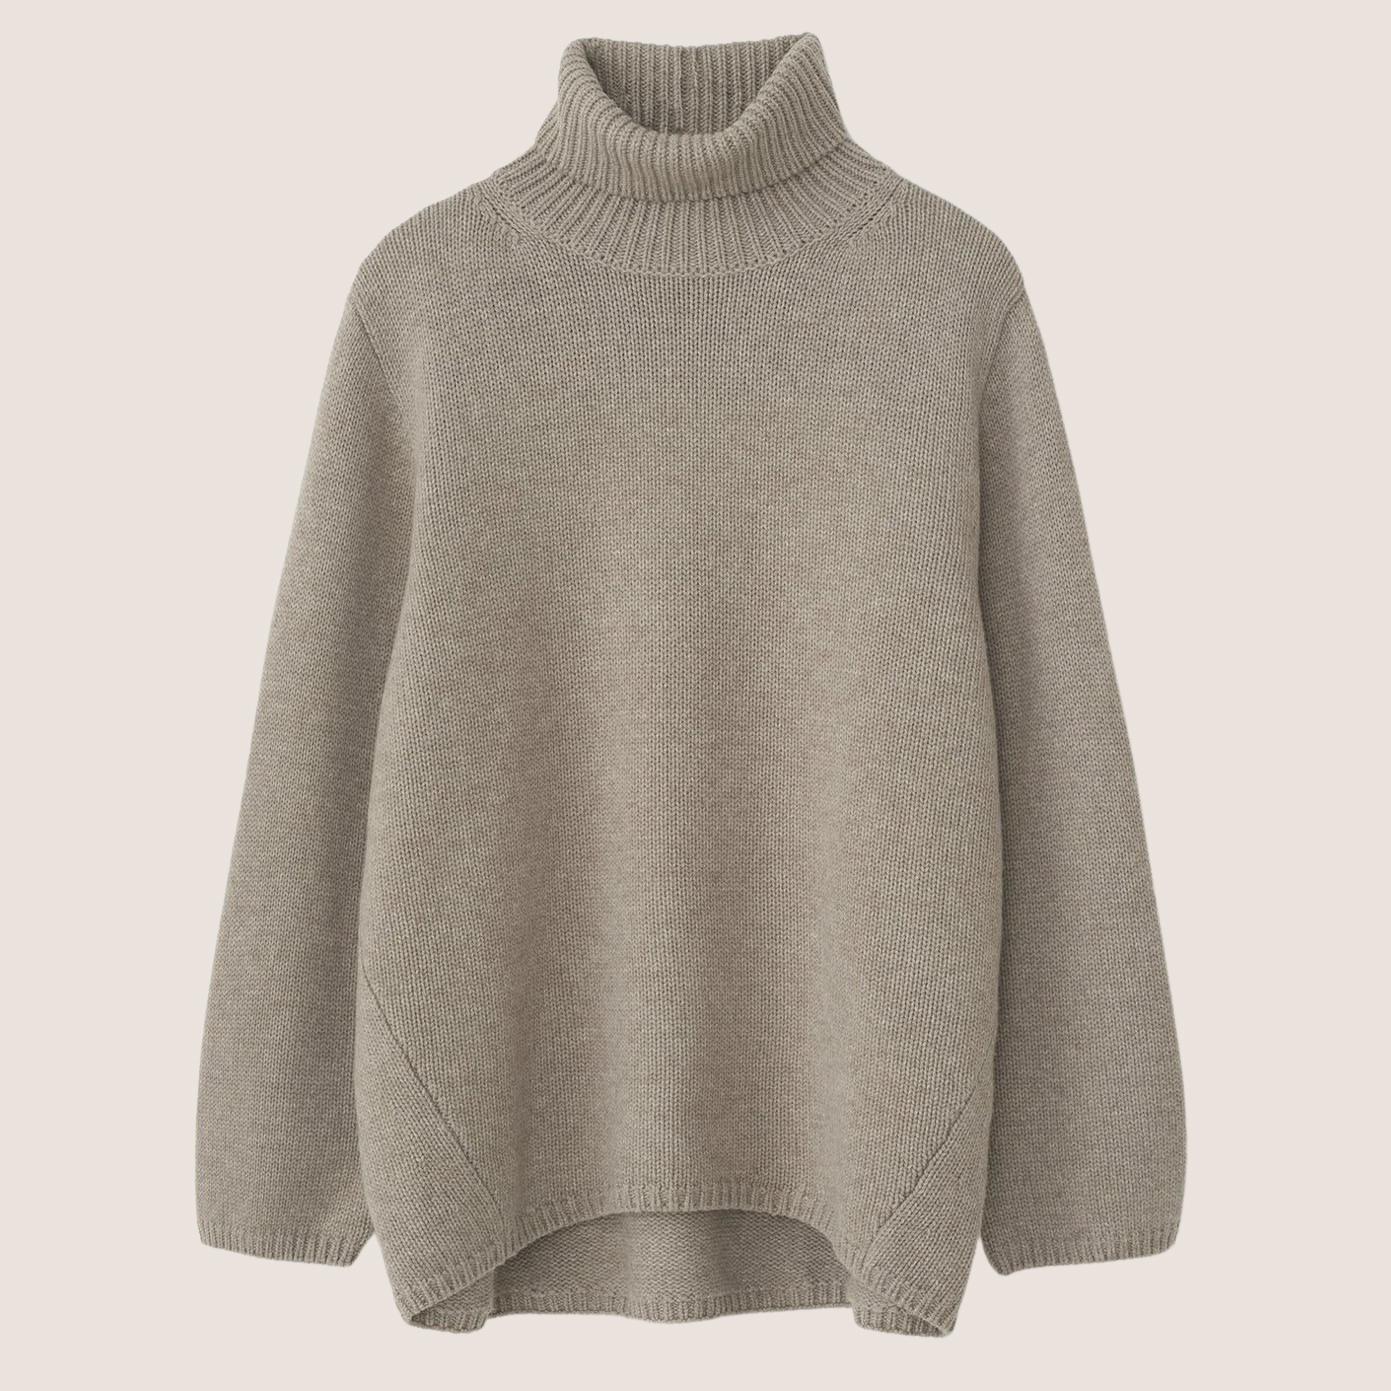 Wool Cashmere Turtleneck